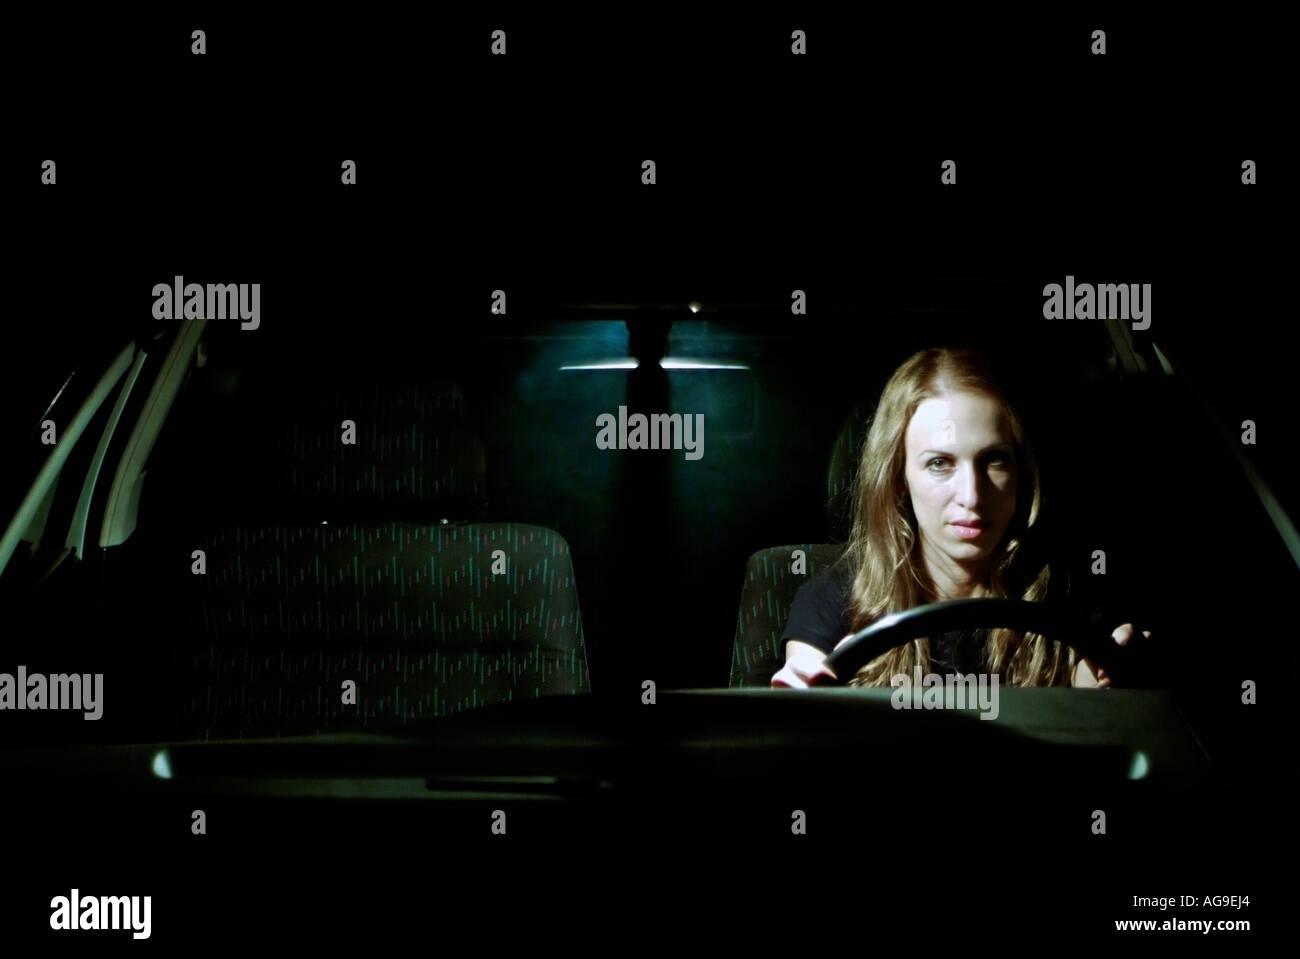 Driving Through The Night Stock Photos & Driving Through ...